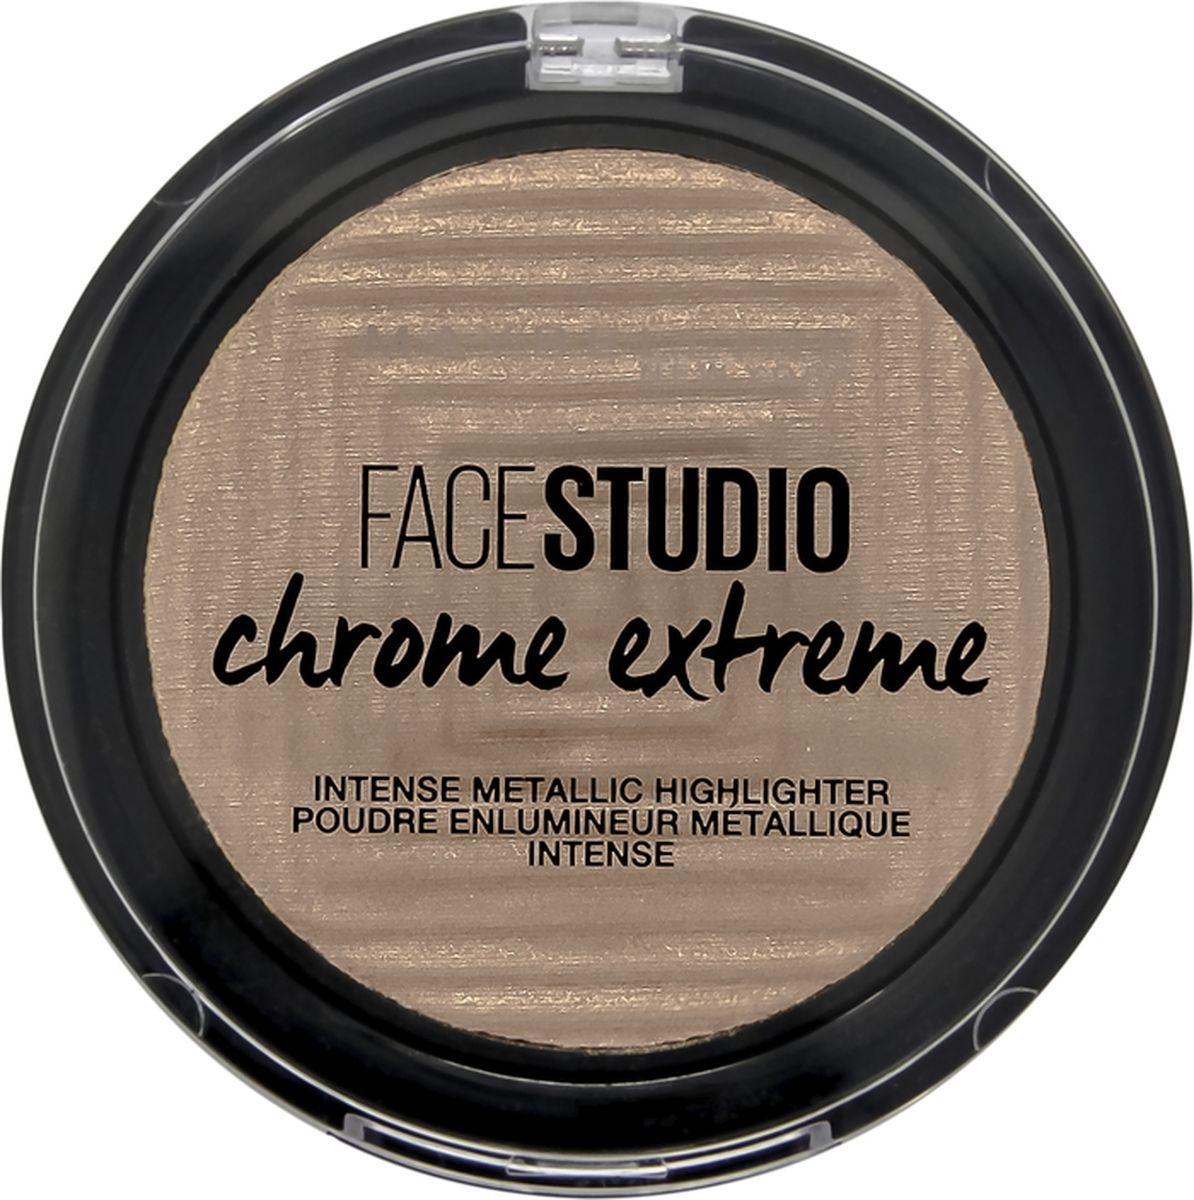 Хайлайтер Maybelline New York Face Studio Chrome Extreme, тон 300, Золотой песок, 6 мл